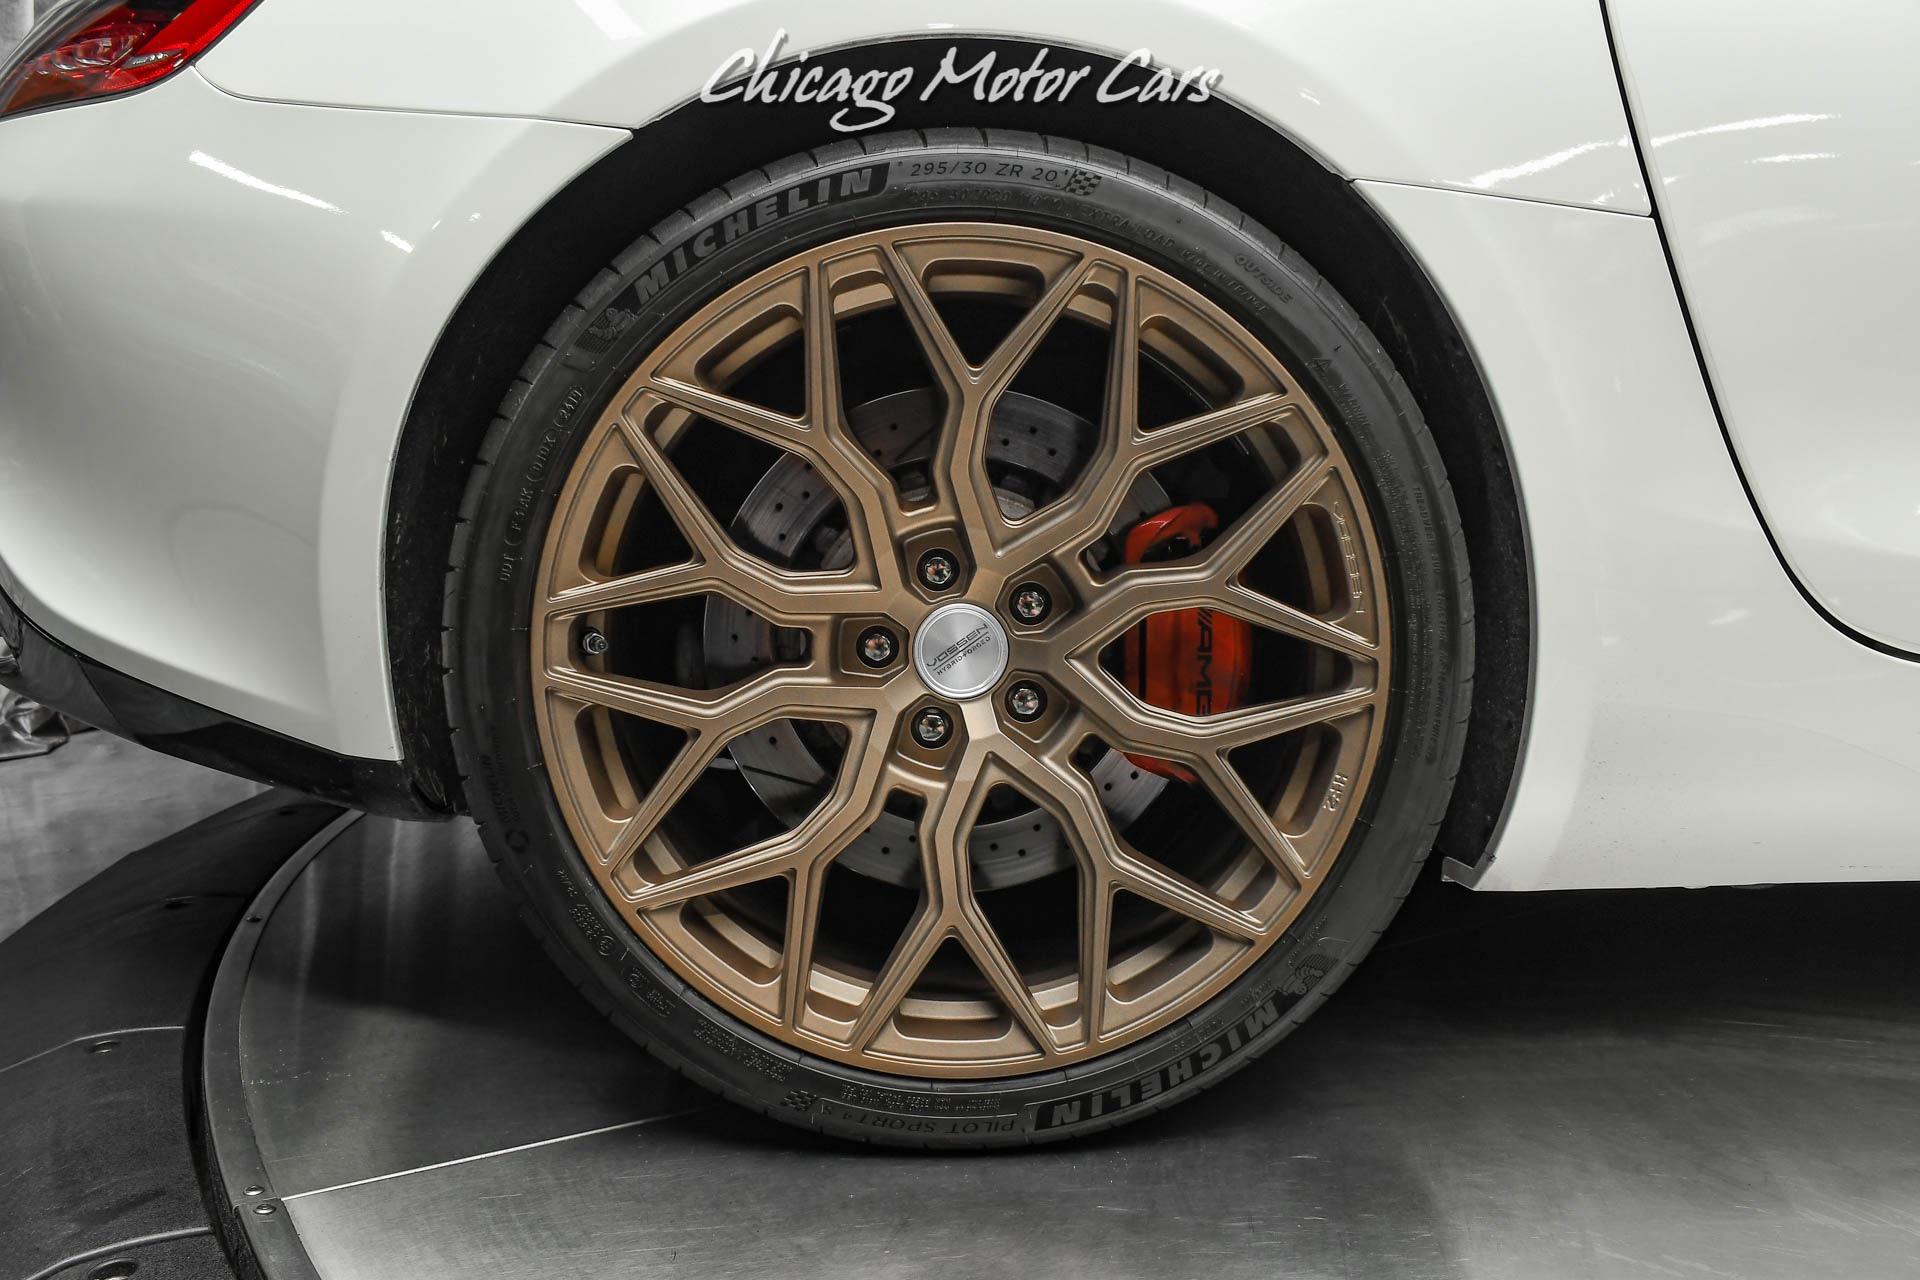 Used-2016-Mercedes-Benz-AMG-GTS-Burmester-Sound-System-VOSSEN-Forged-Wheels-Prior-Design-Wing---Bumper